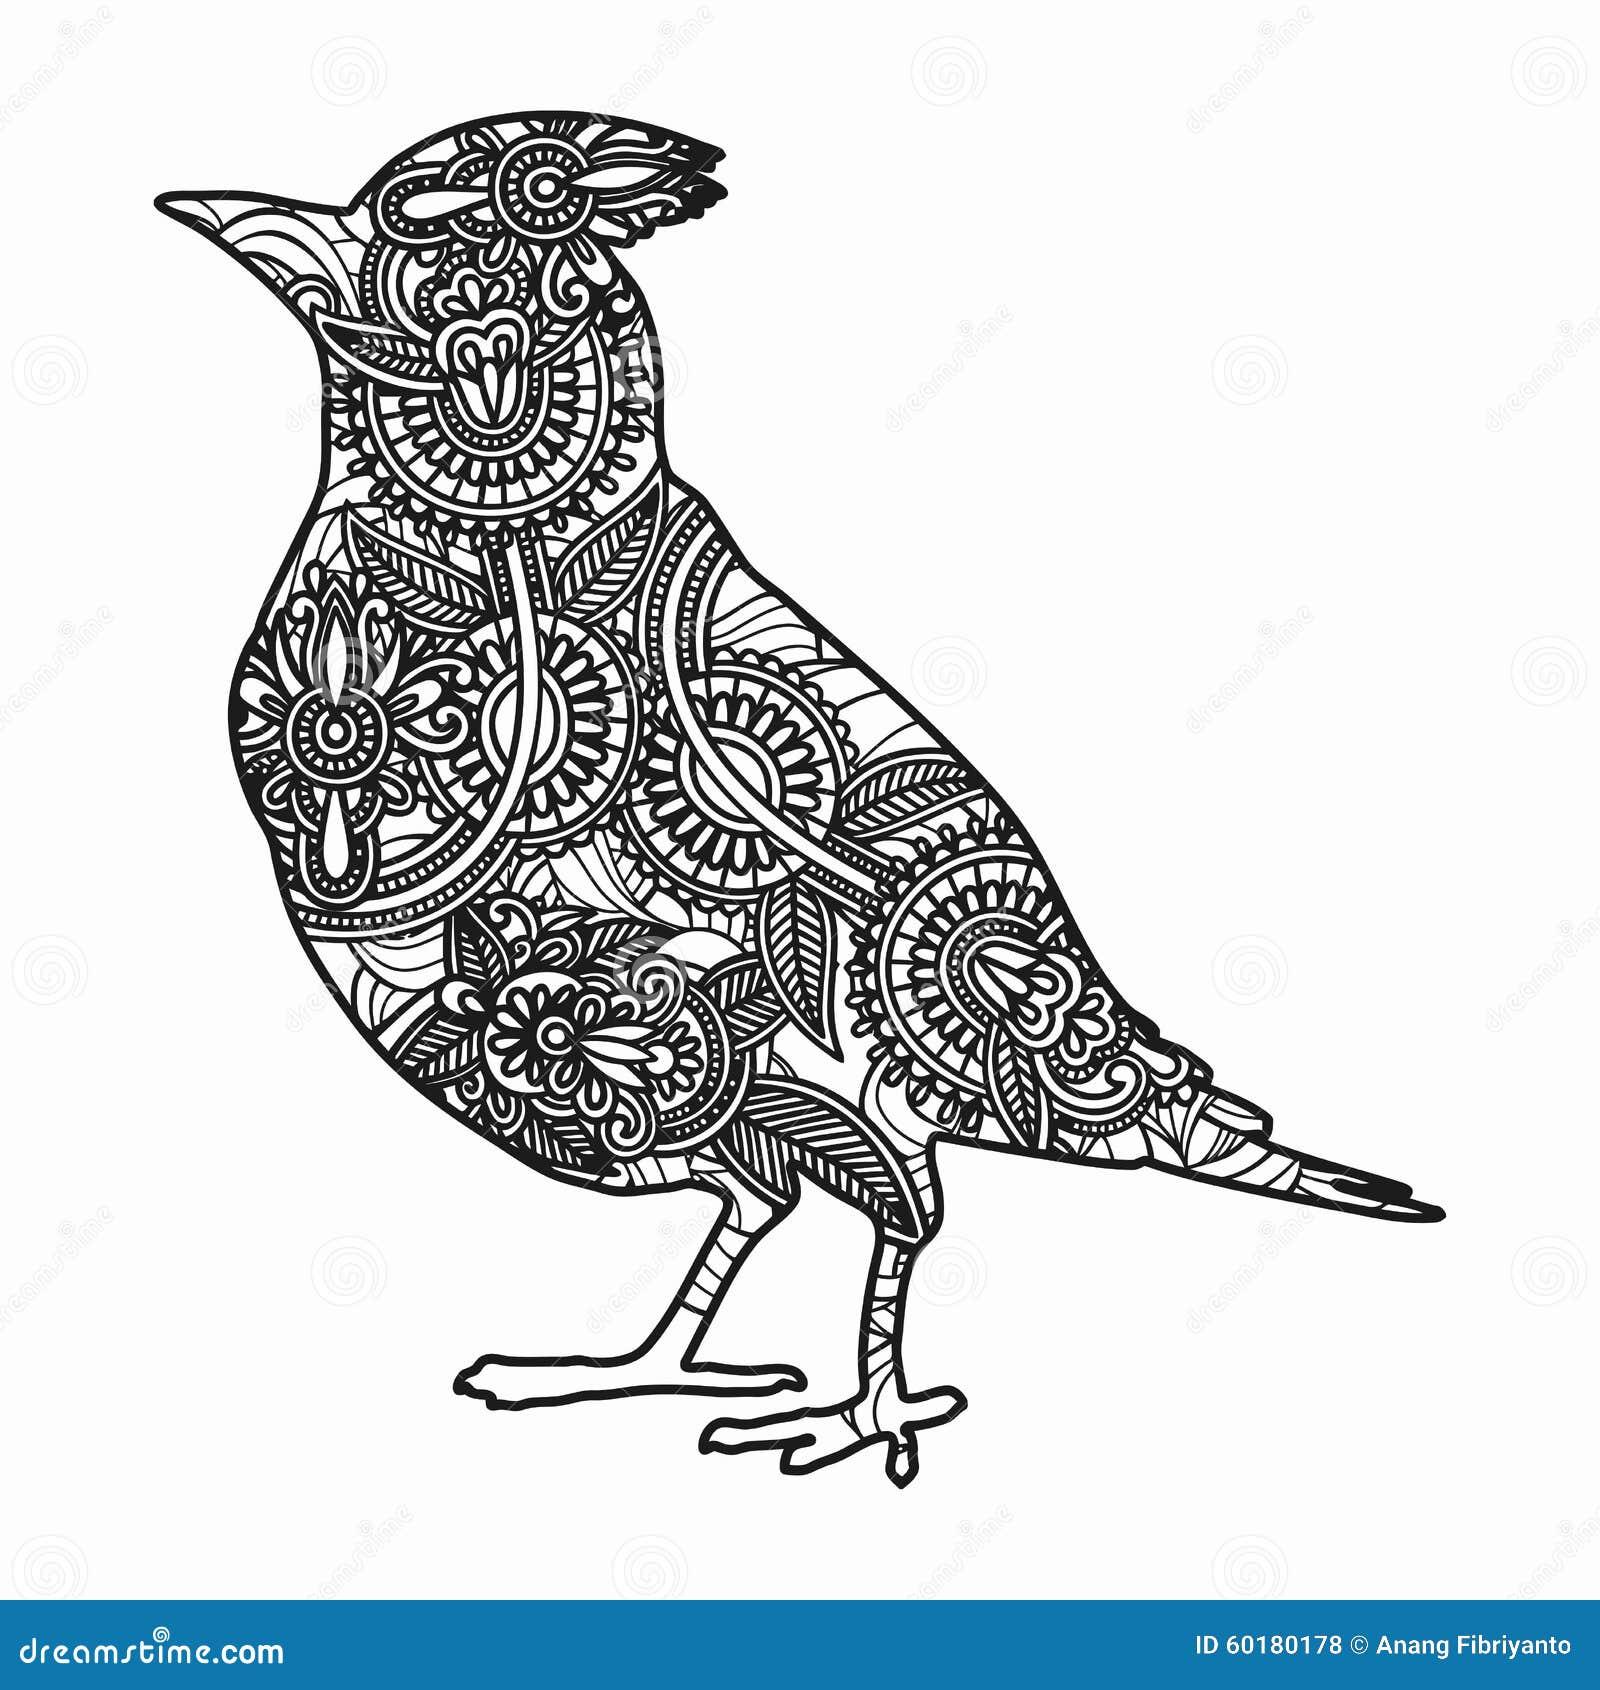 Zentangle Stylized Bird Illustration. Hand Drawn Doodle